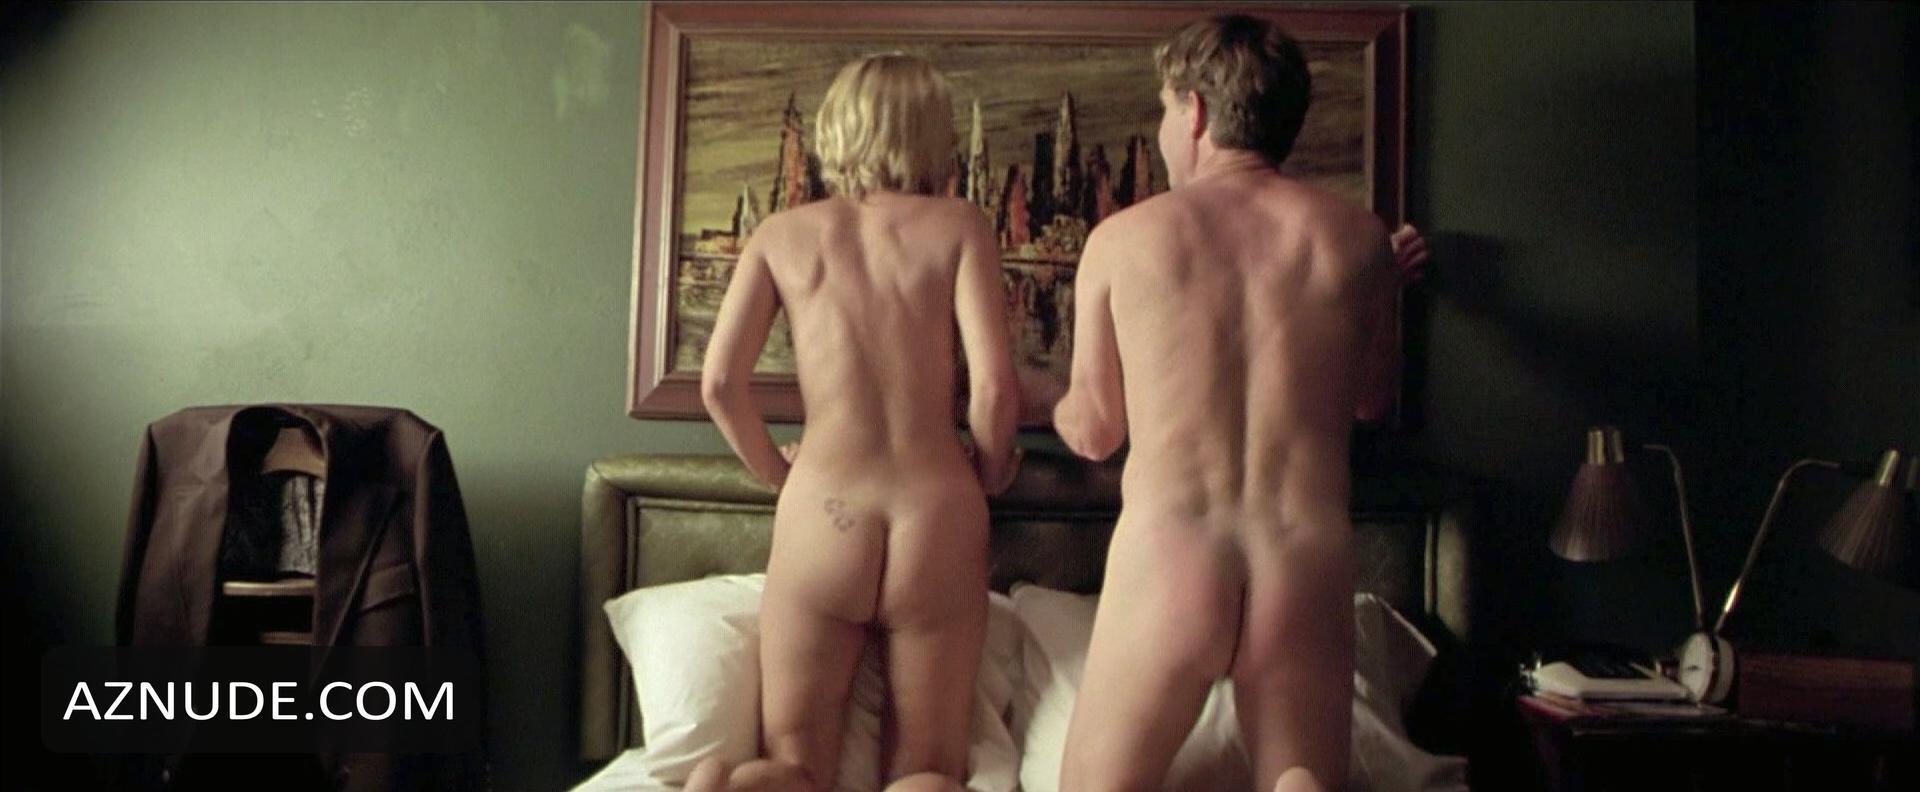 Maria Bello - Full Frontal Nudity, Sex